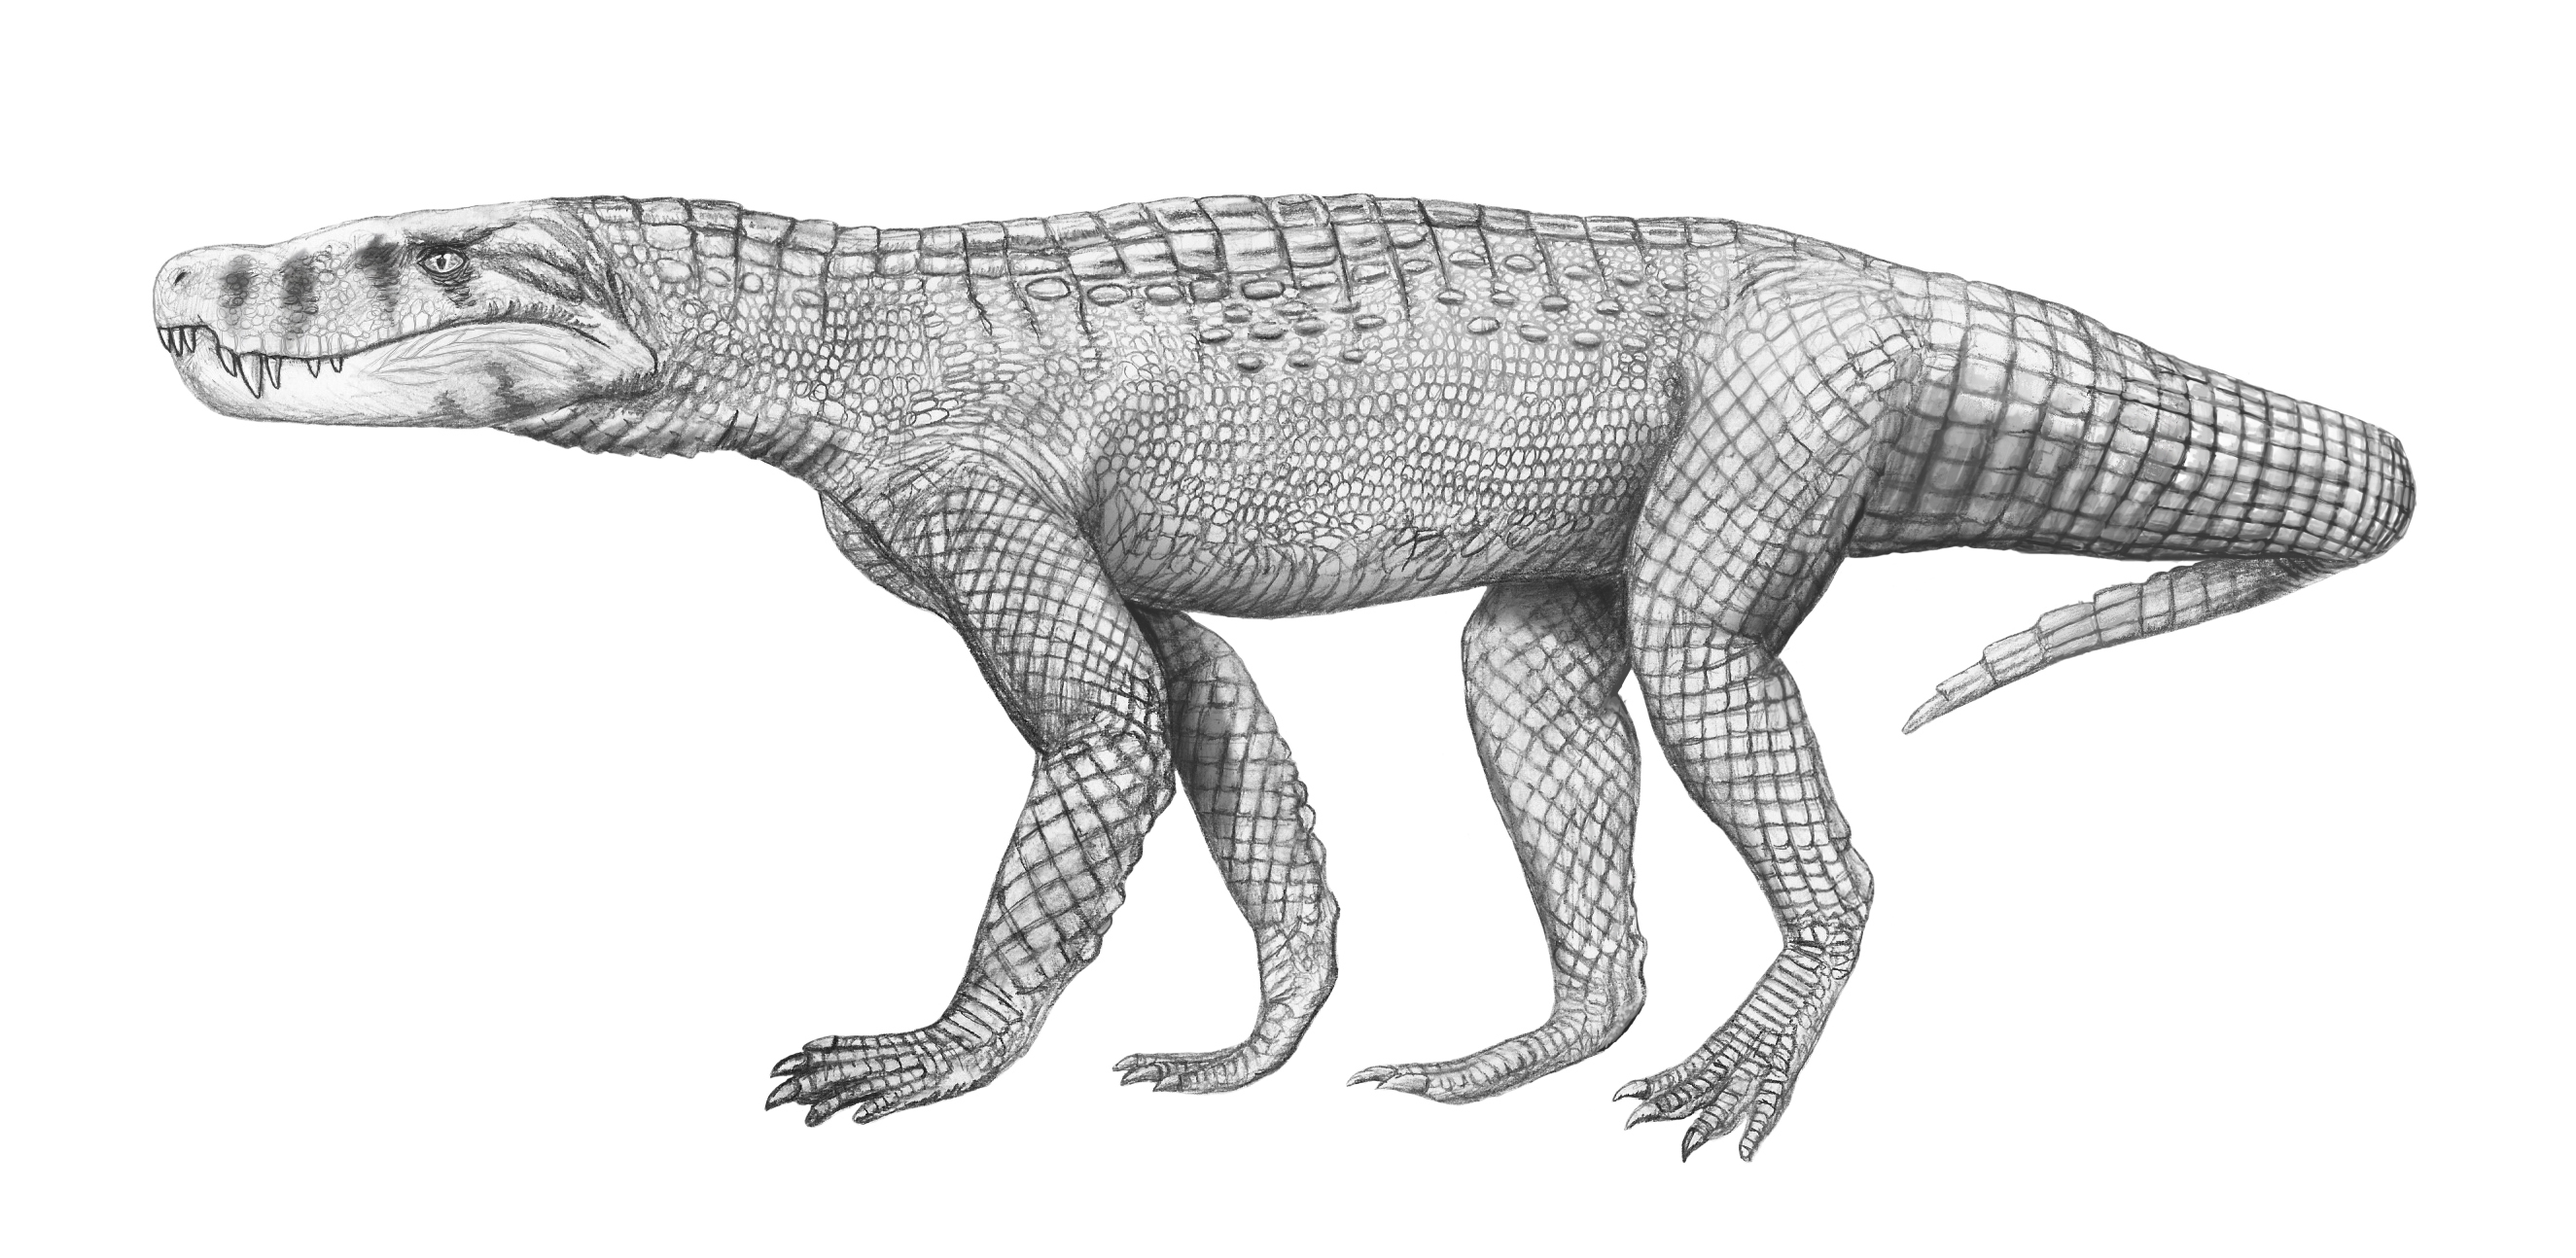 http://upload.wikimedia.org/wikipedia/commons/e/ea/Baurusuchus_albertoi.jpg